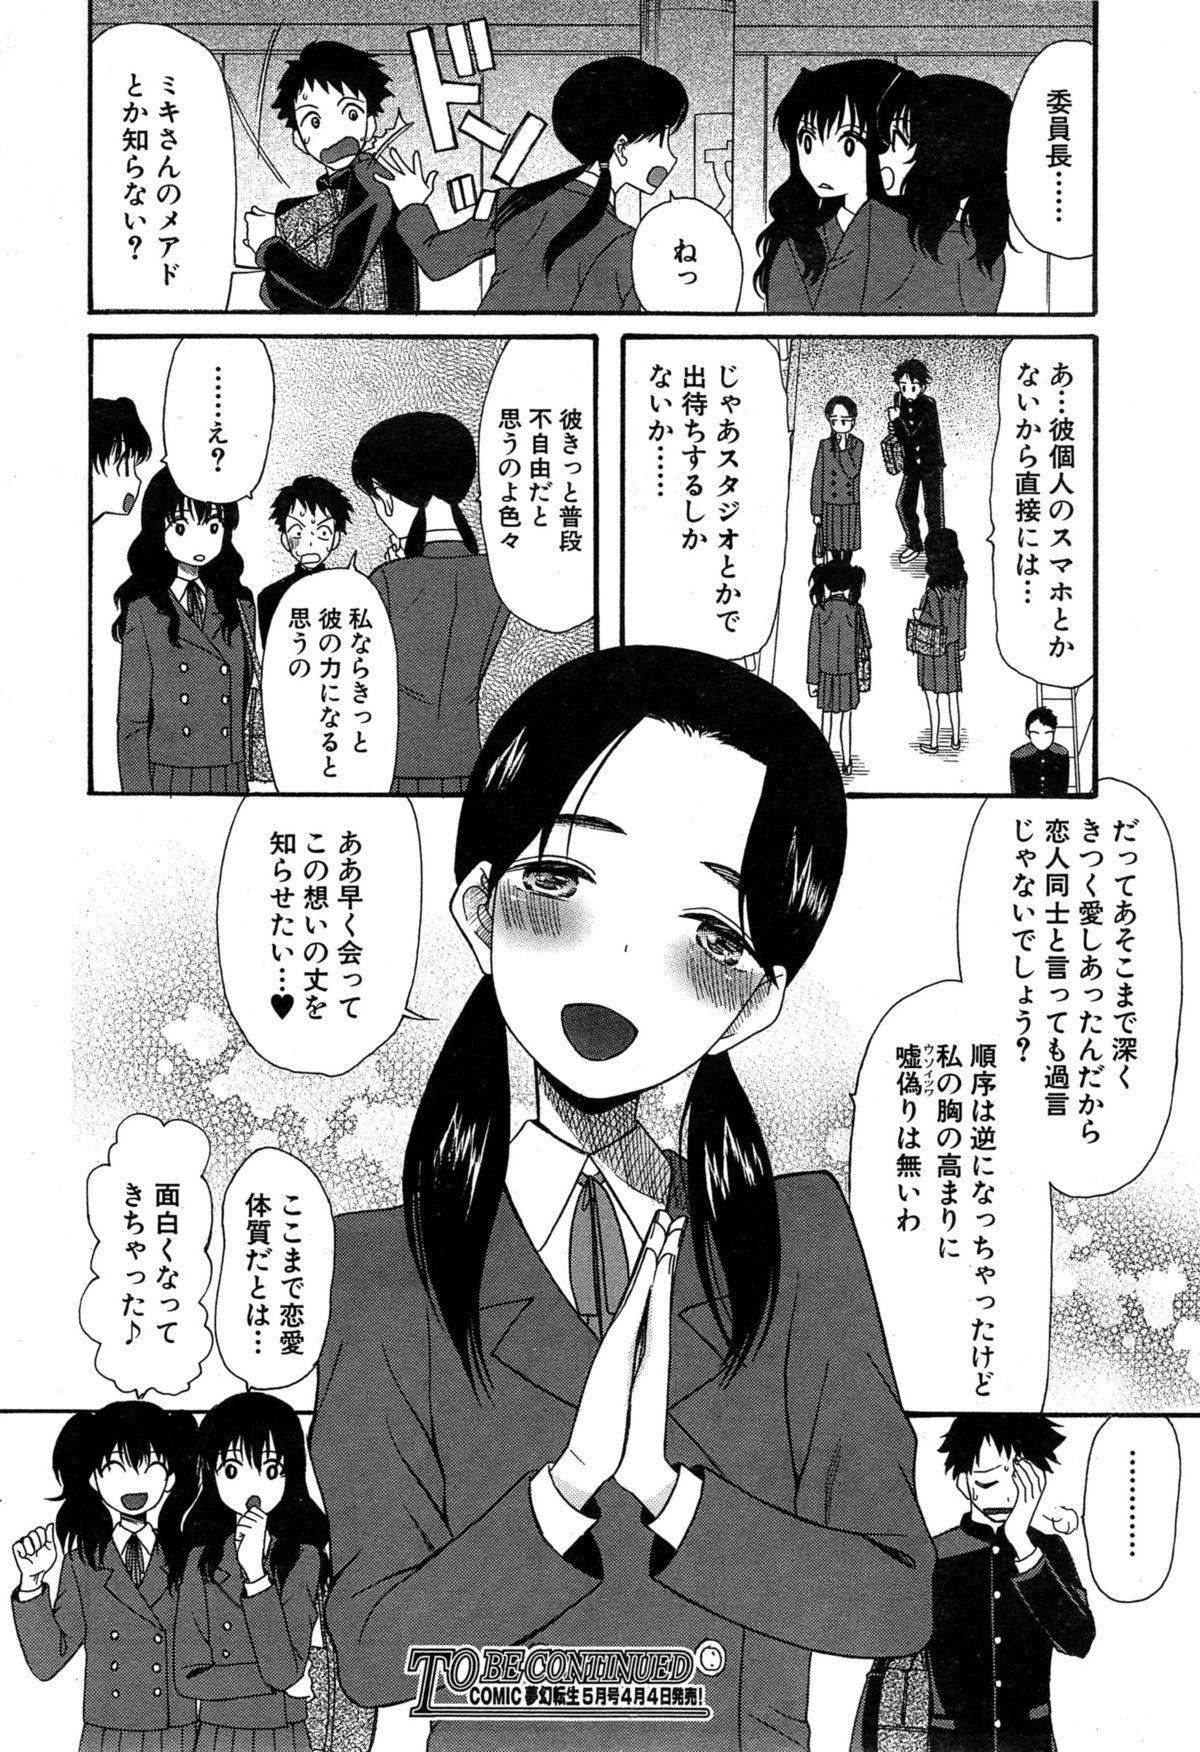 Kawaiku Natte Omocha ni Natte 59